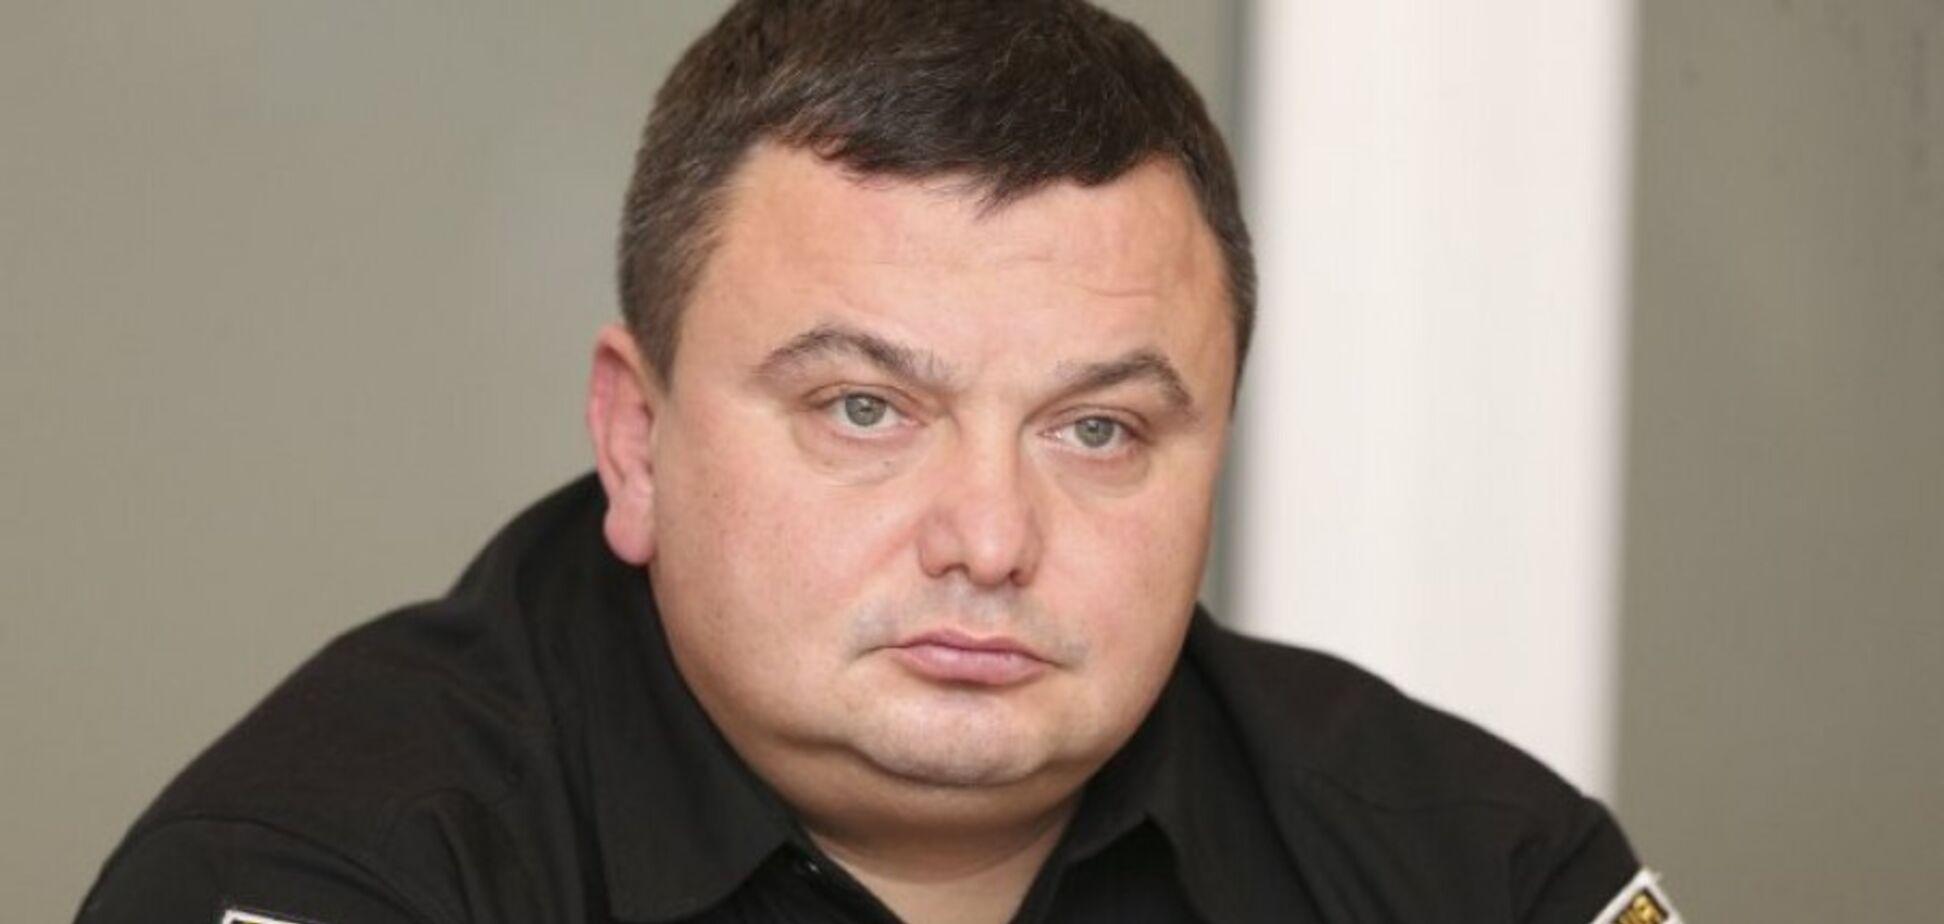 Убийство ребенка под Киевом: Князев уволил главу Нацполиции области